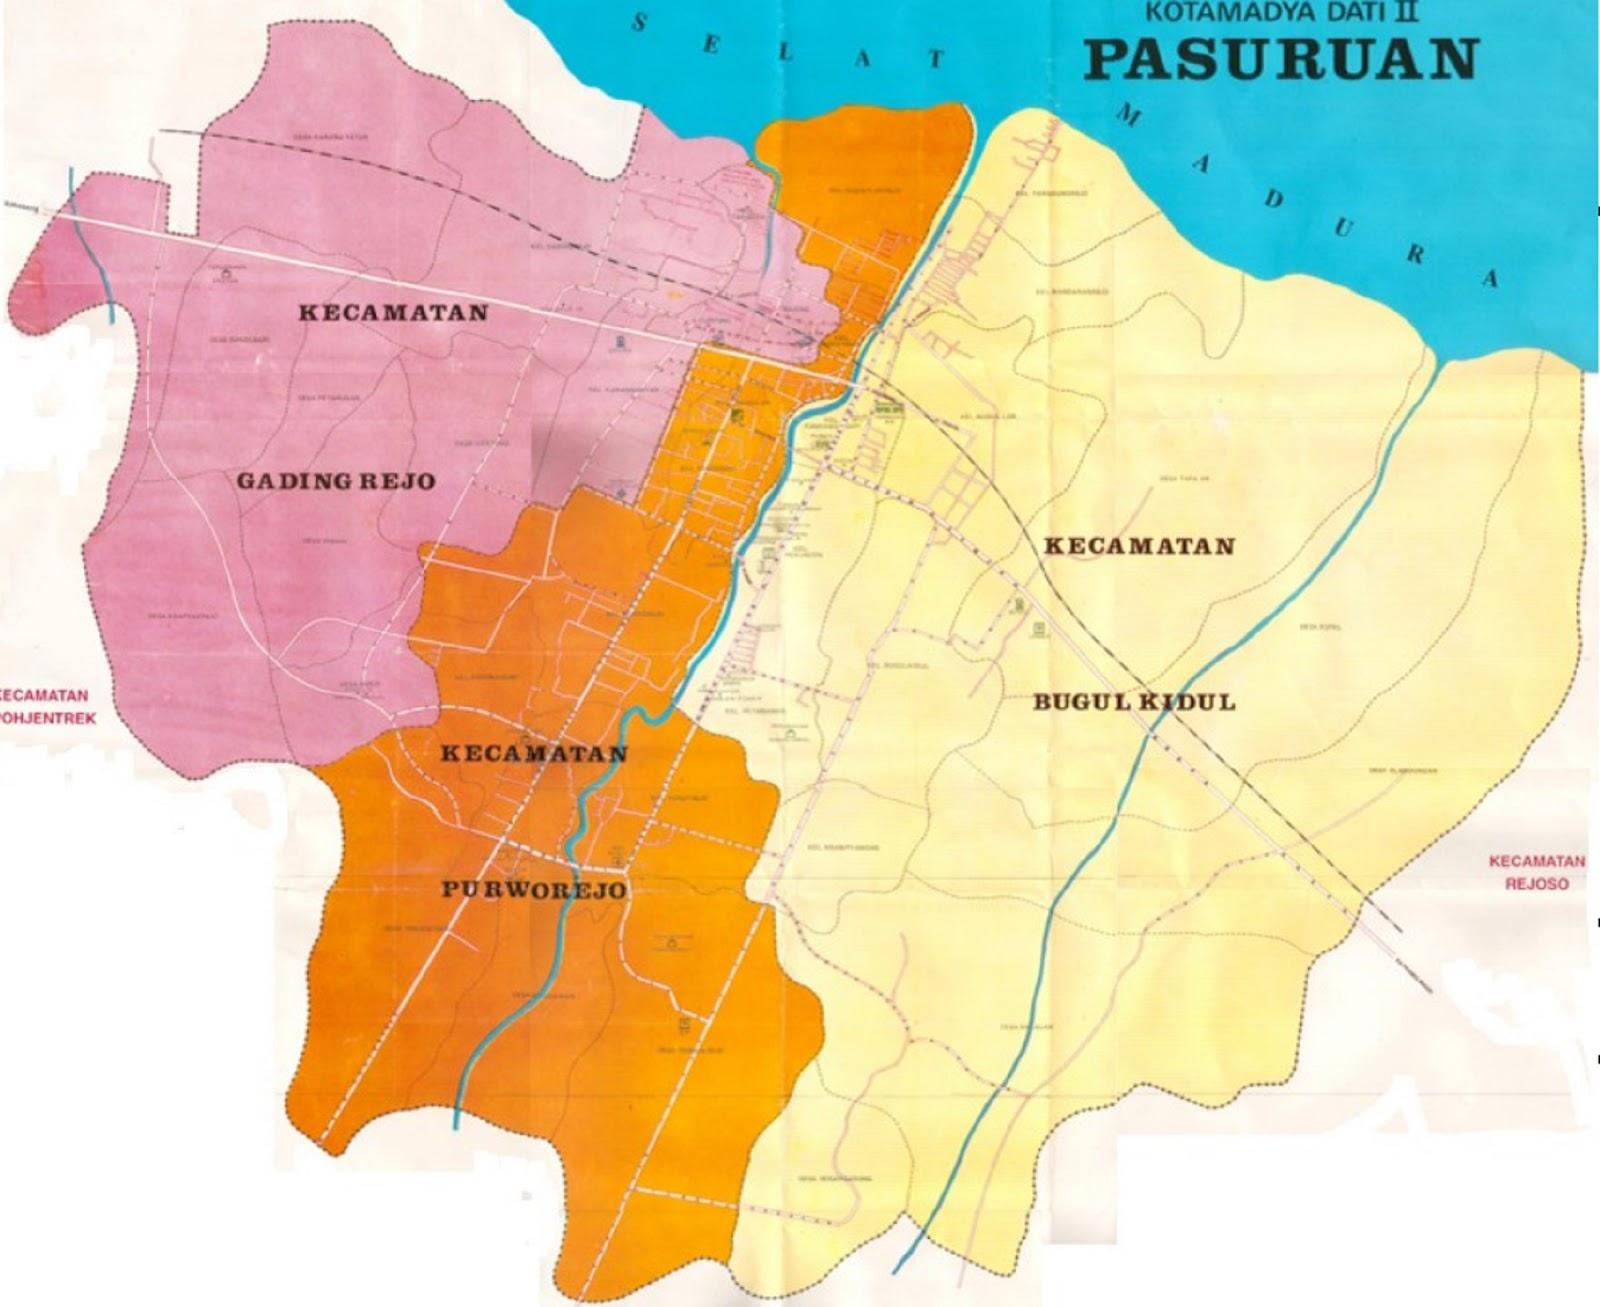 Peta Kota Pasuruan